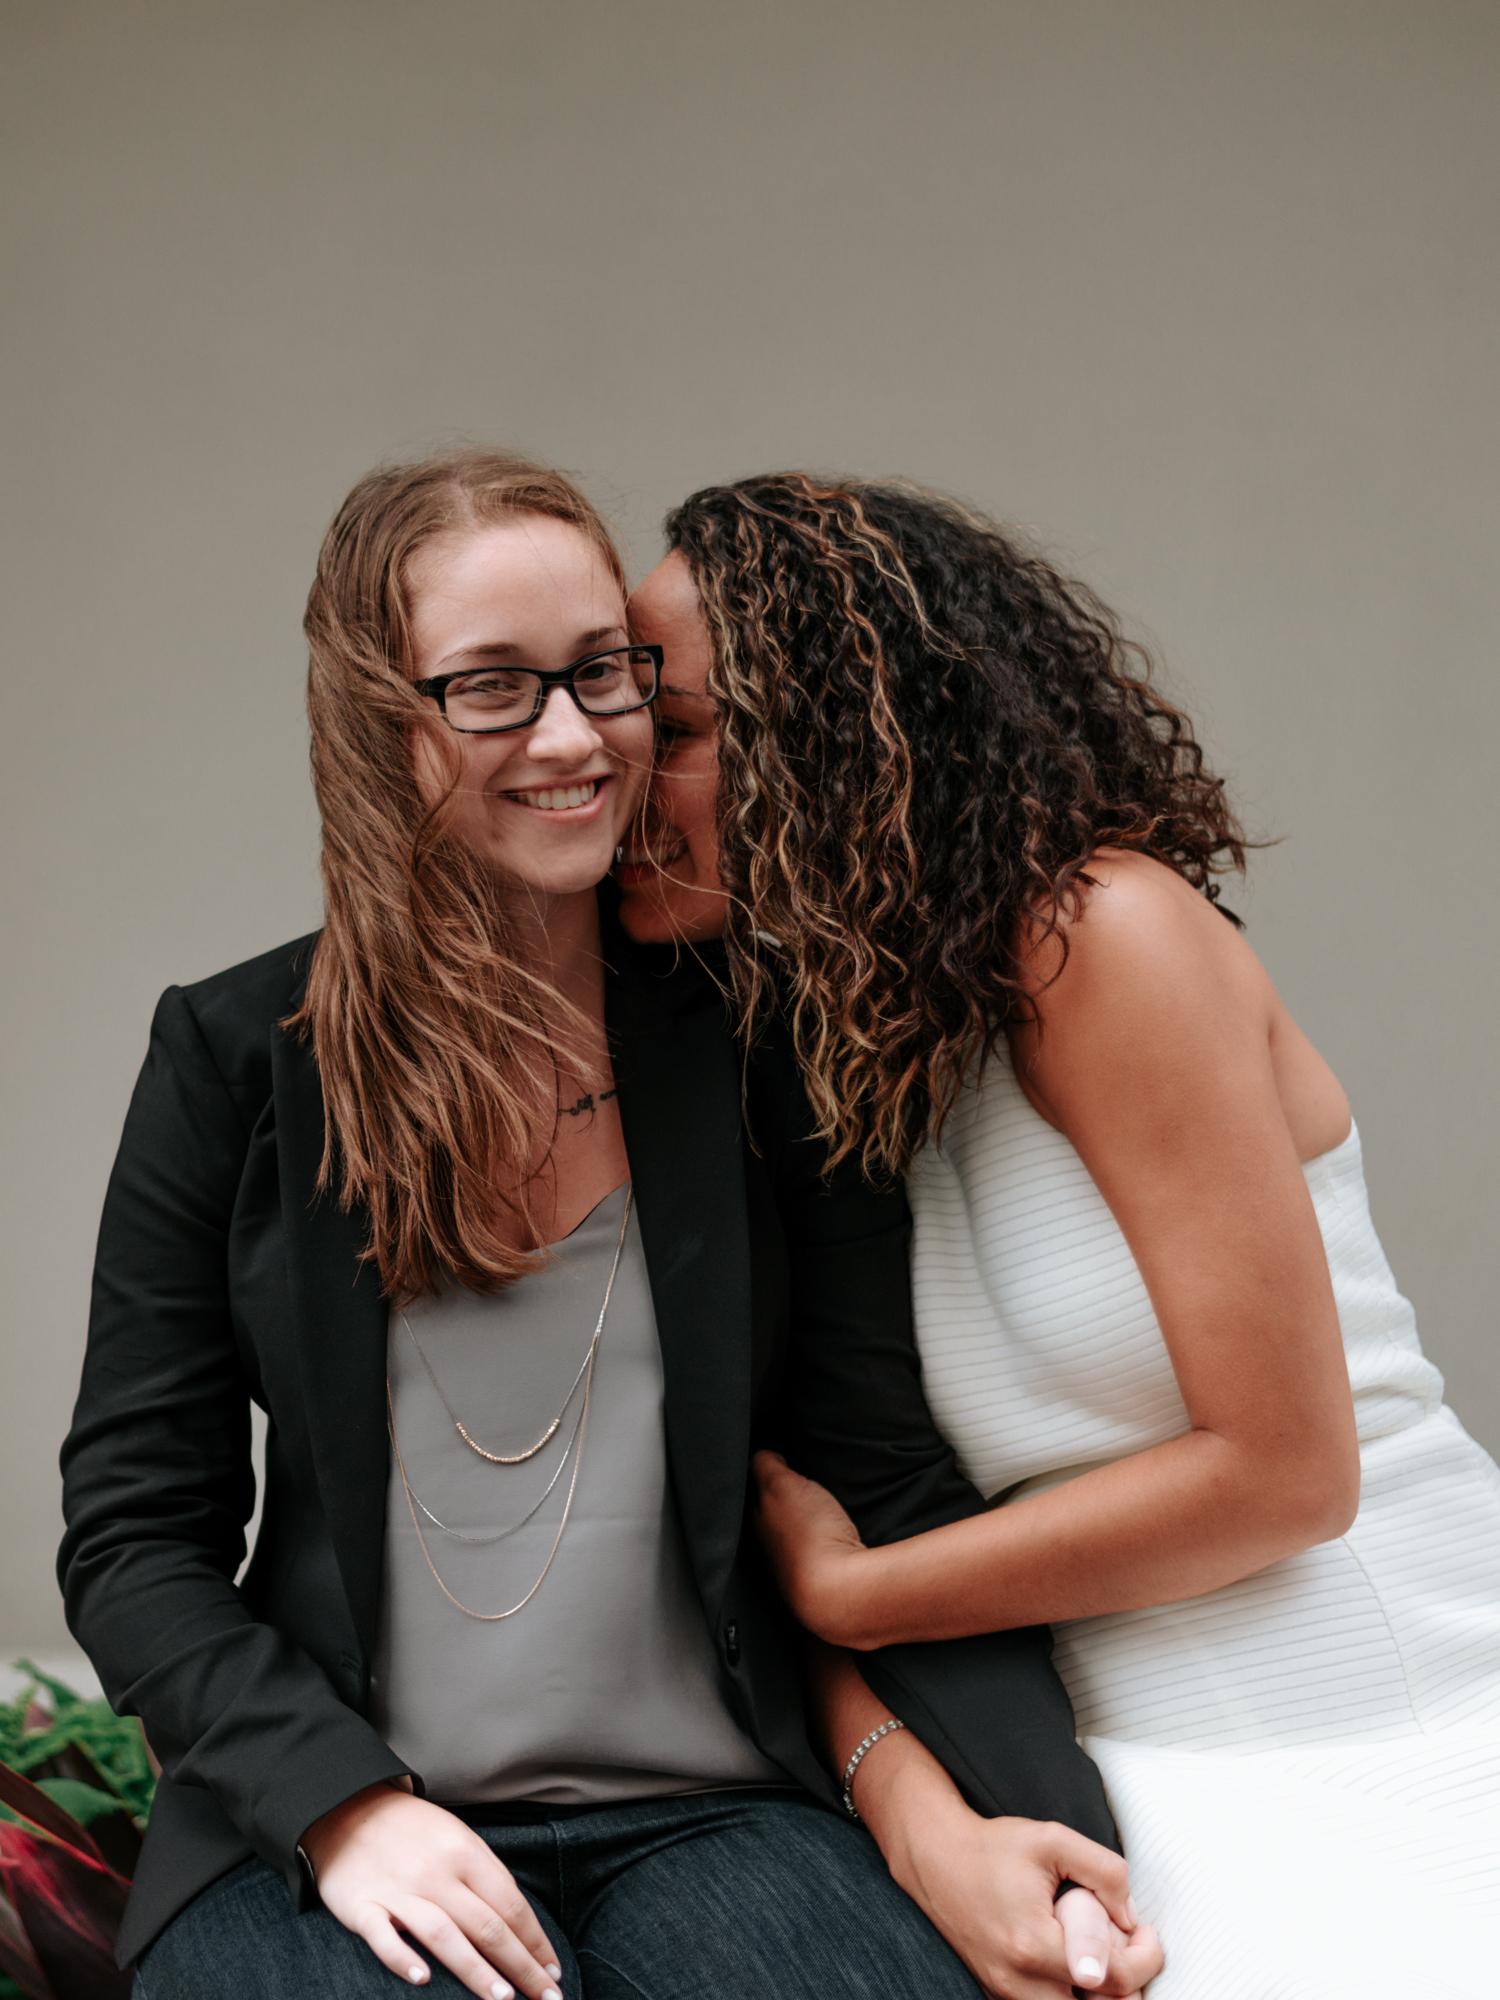 Seattle LGBTQ Wedding Photographer Stolen Glimpses 14.jpg